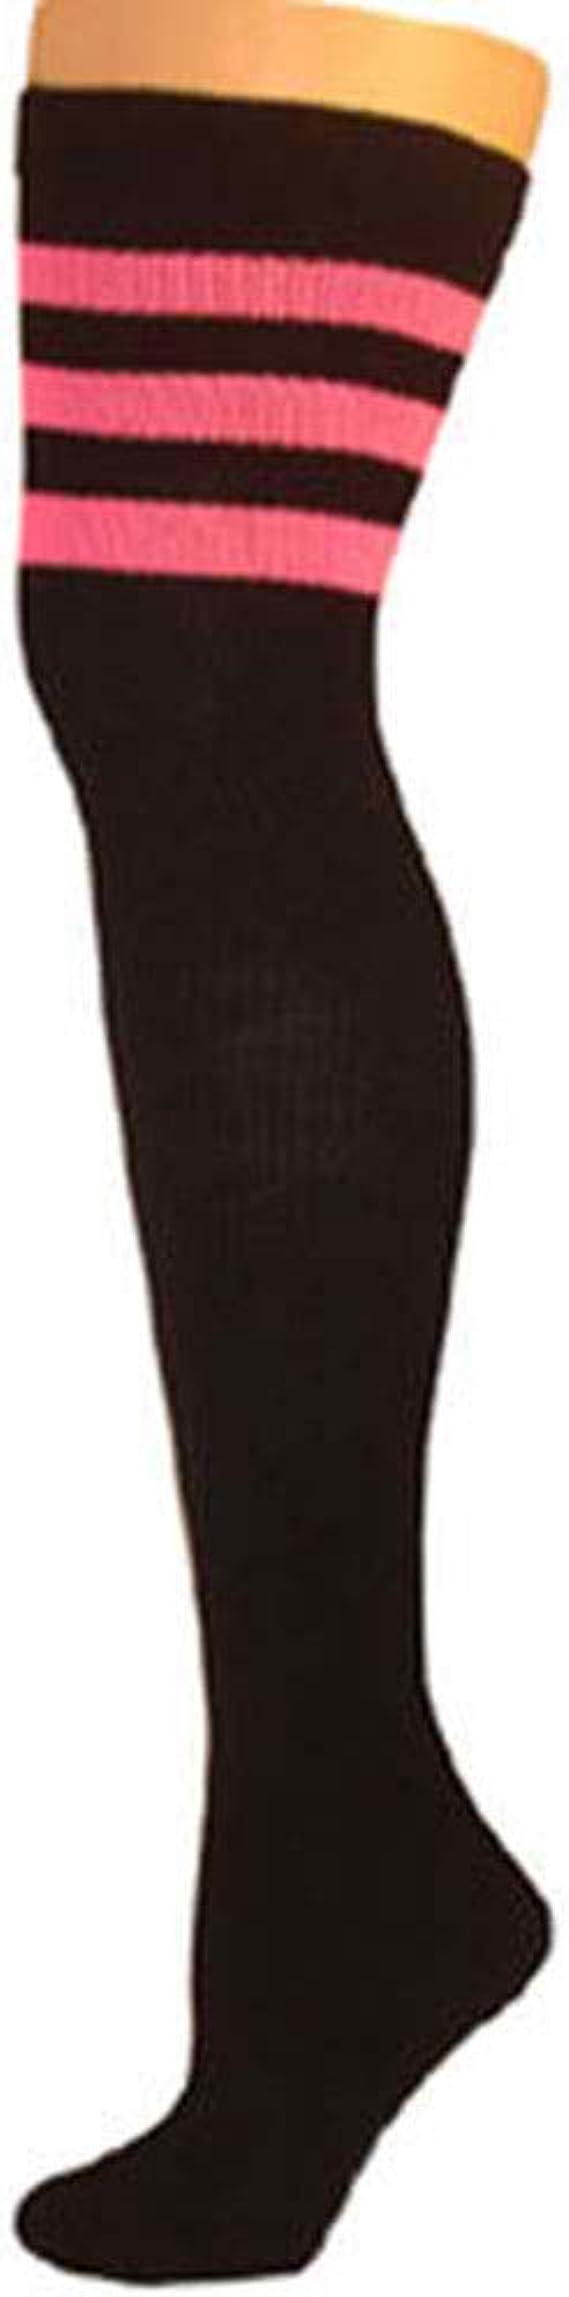 Black Retro Shorts w//Neon Red Trim and skatersocks-Lg